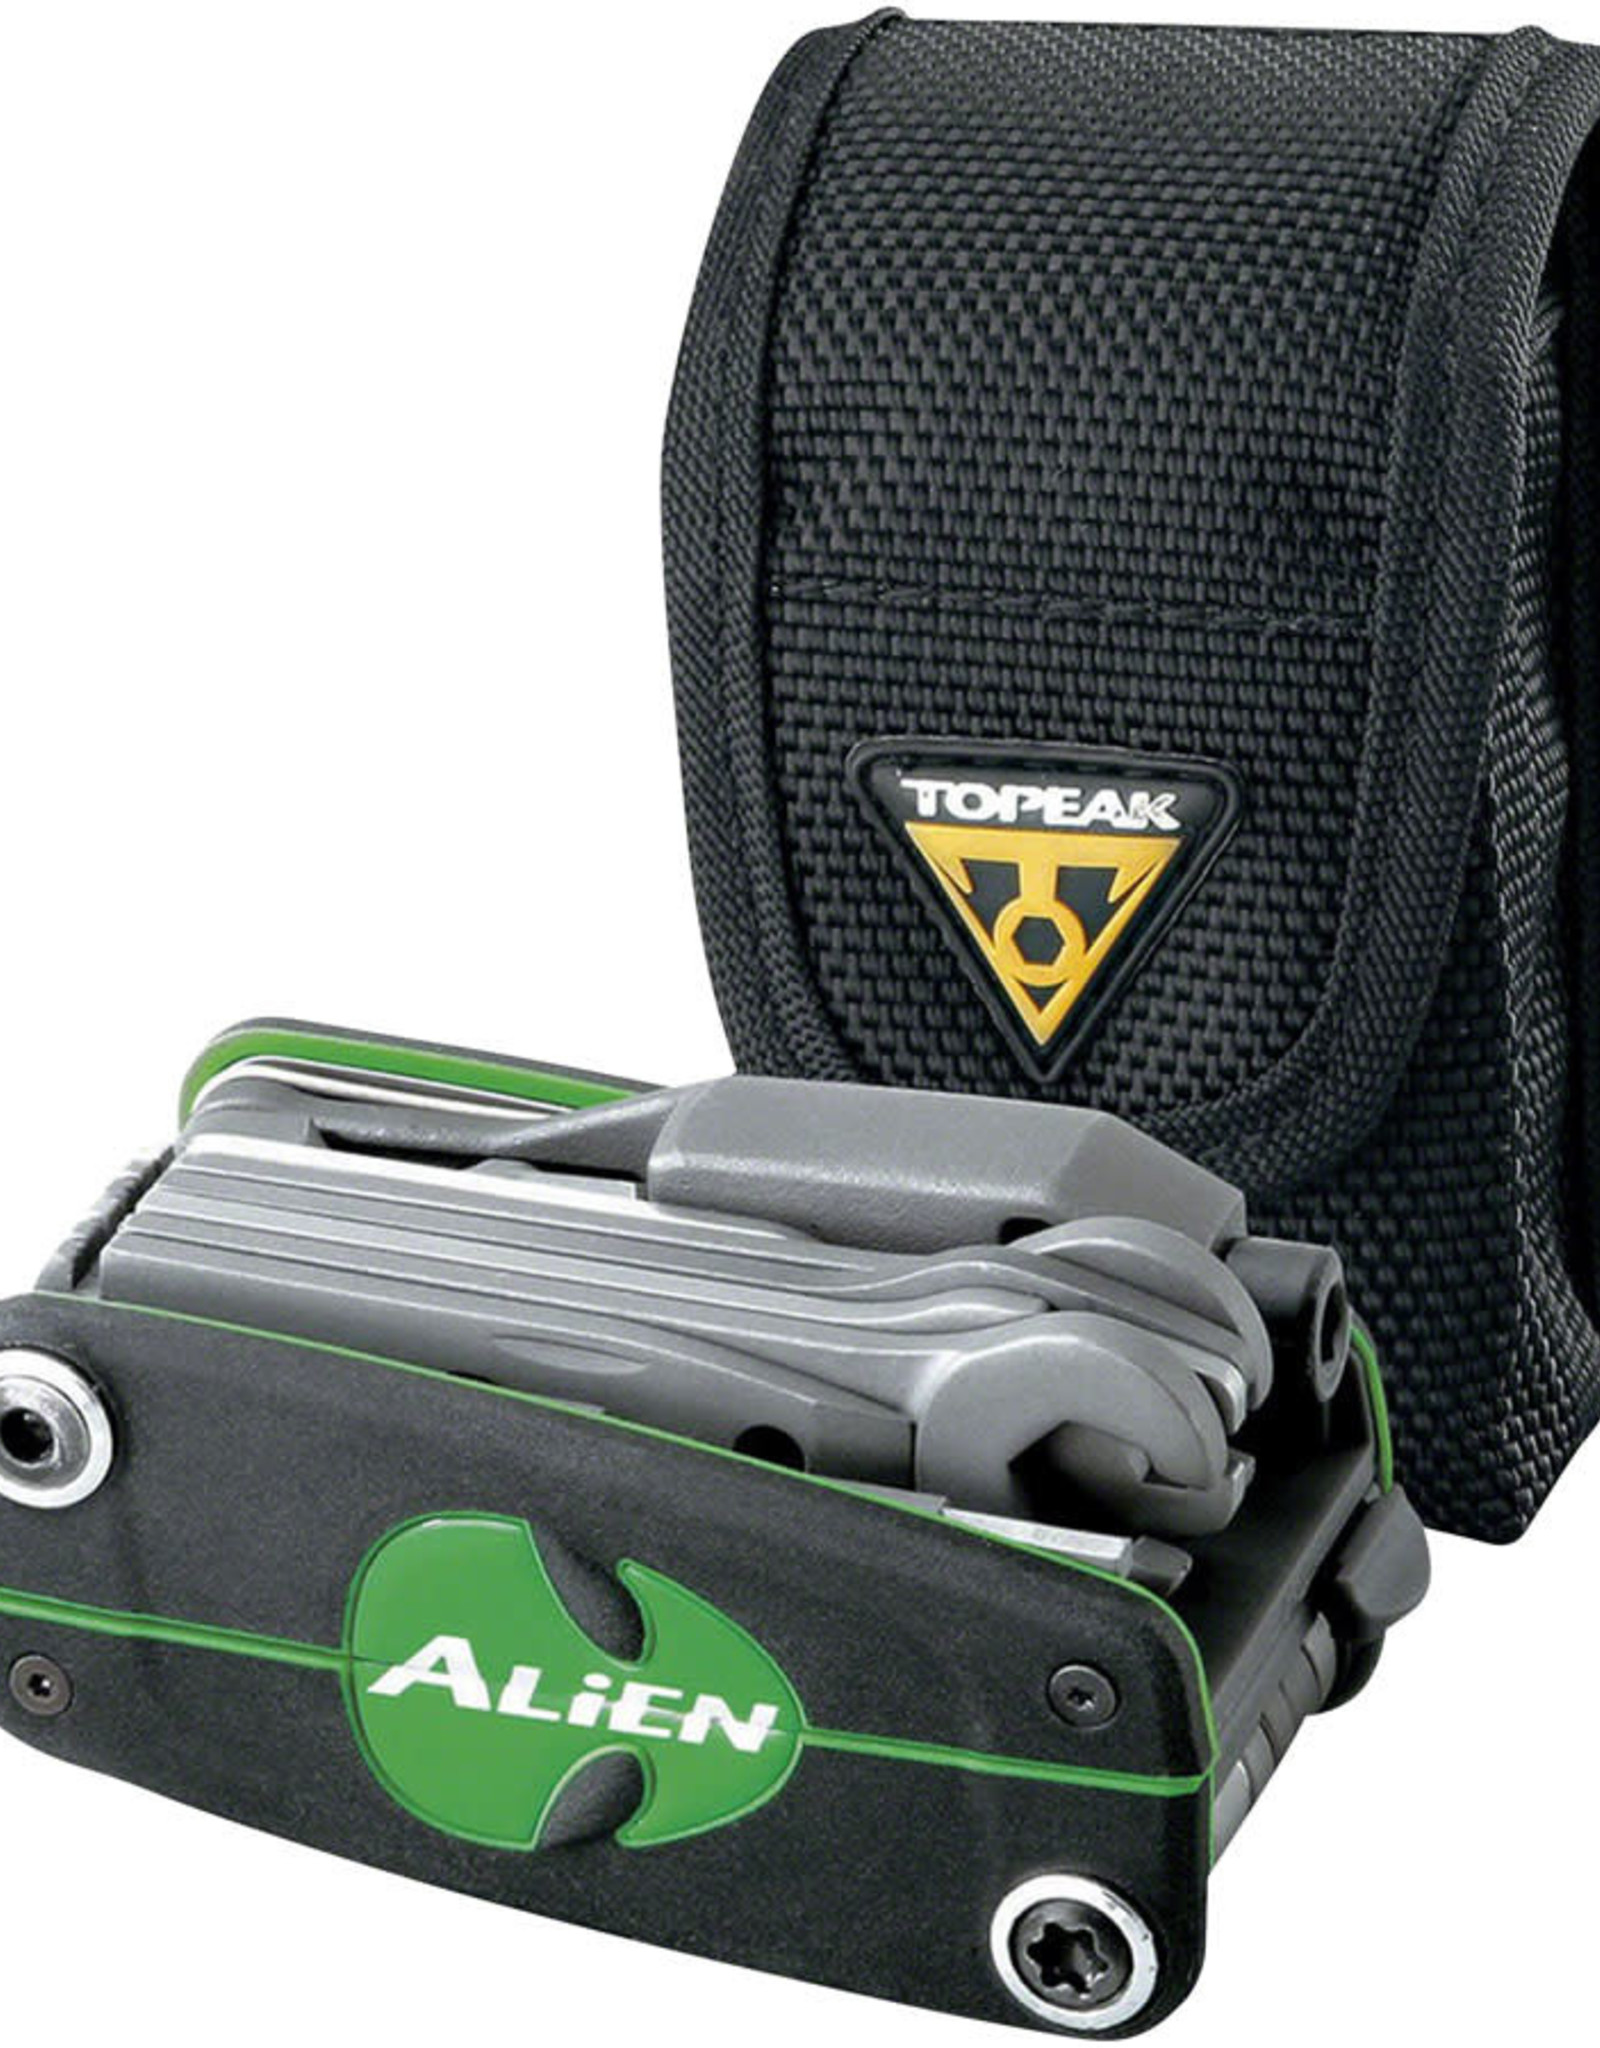 Topeak Alien III Bike Multi-Tool